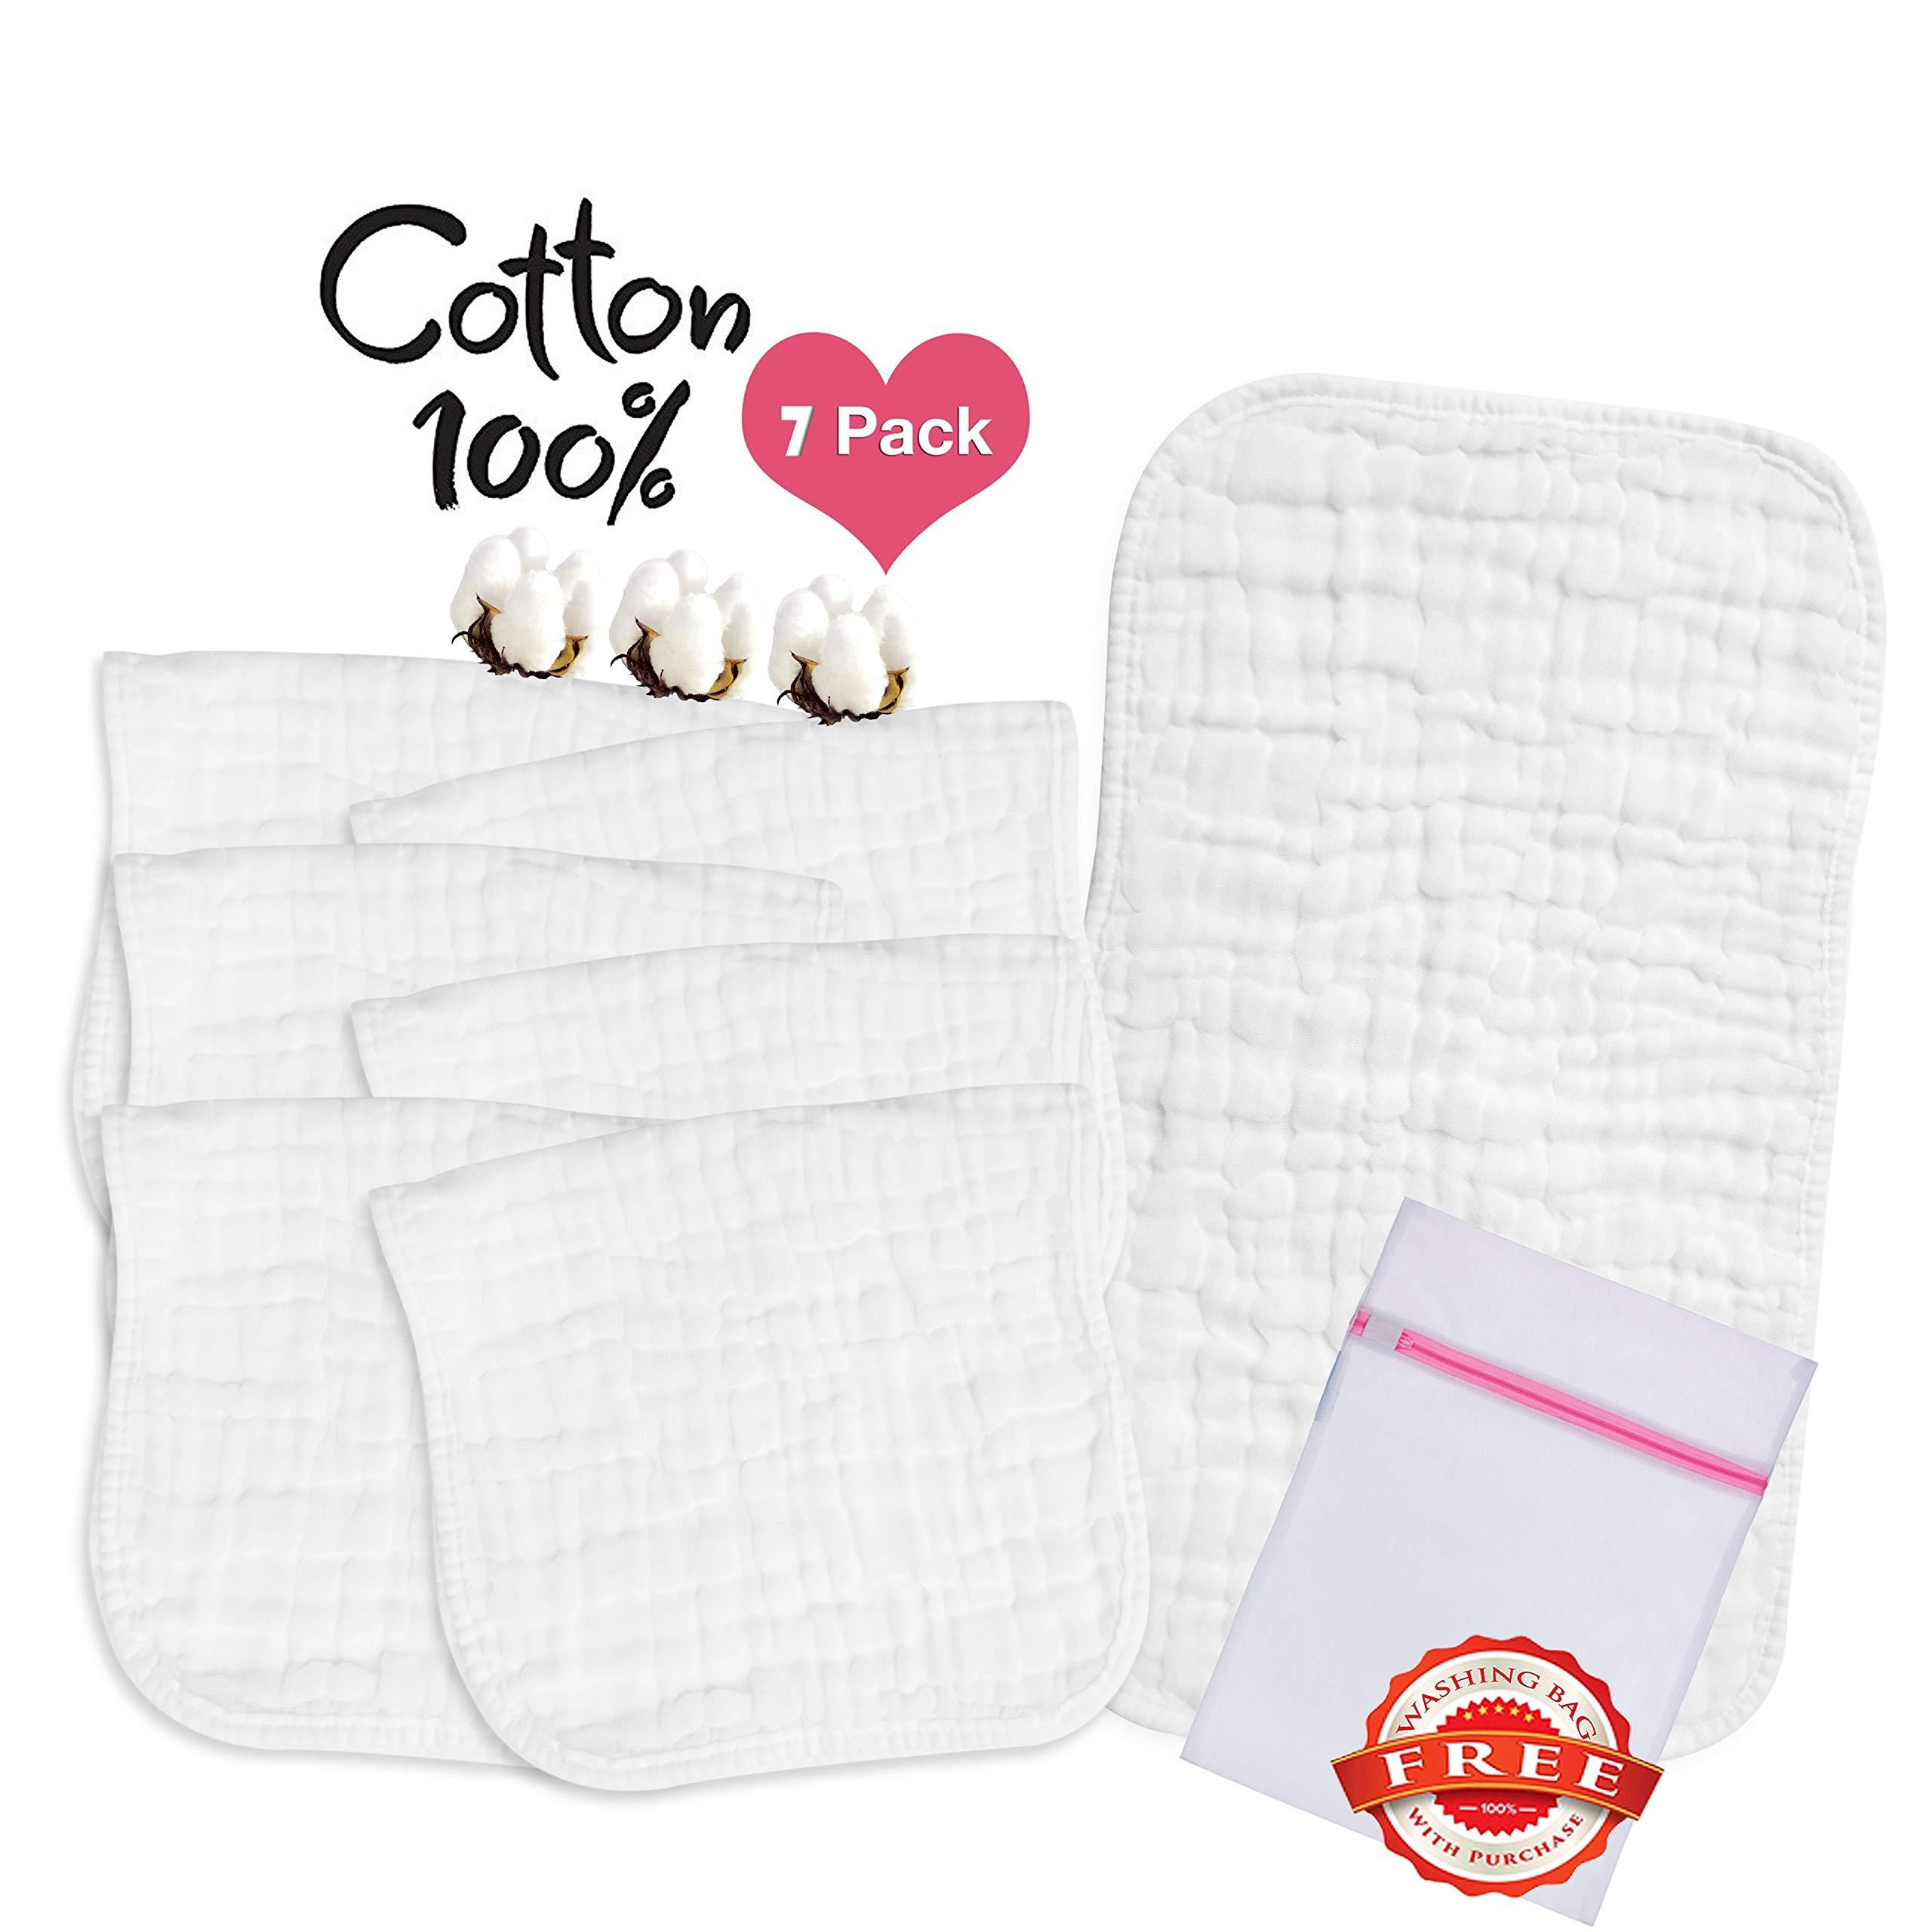 Muslin Burp Cloths''100% Organic Cotton'',Baby Burp Cloth,Newborn Burping Rags - Great Baby Shower Gift,Plain White,7 Pack, Large 20''x10'', 7Layer Design by LOVEMY